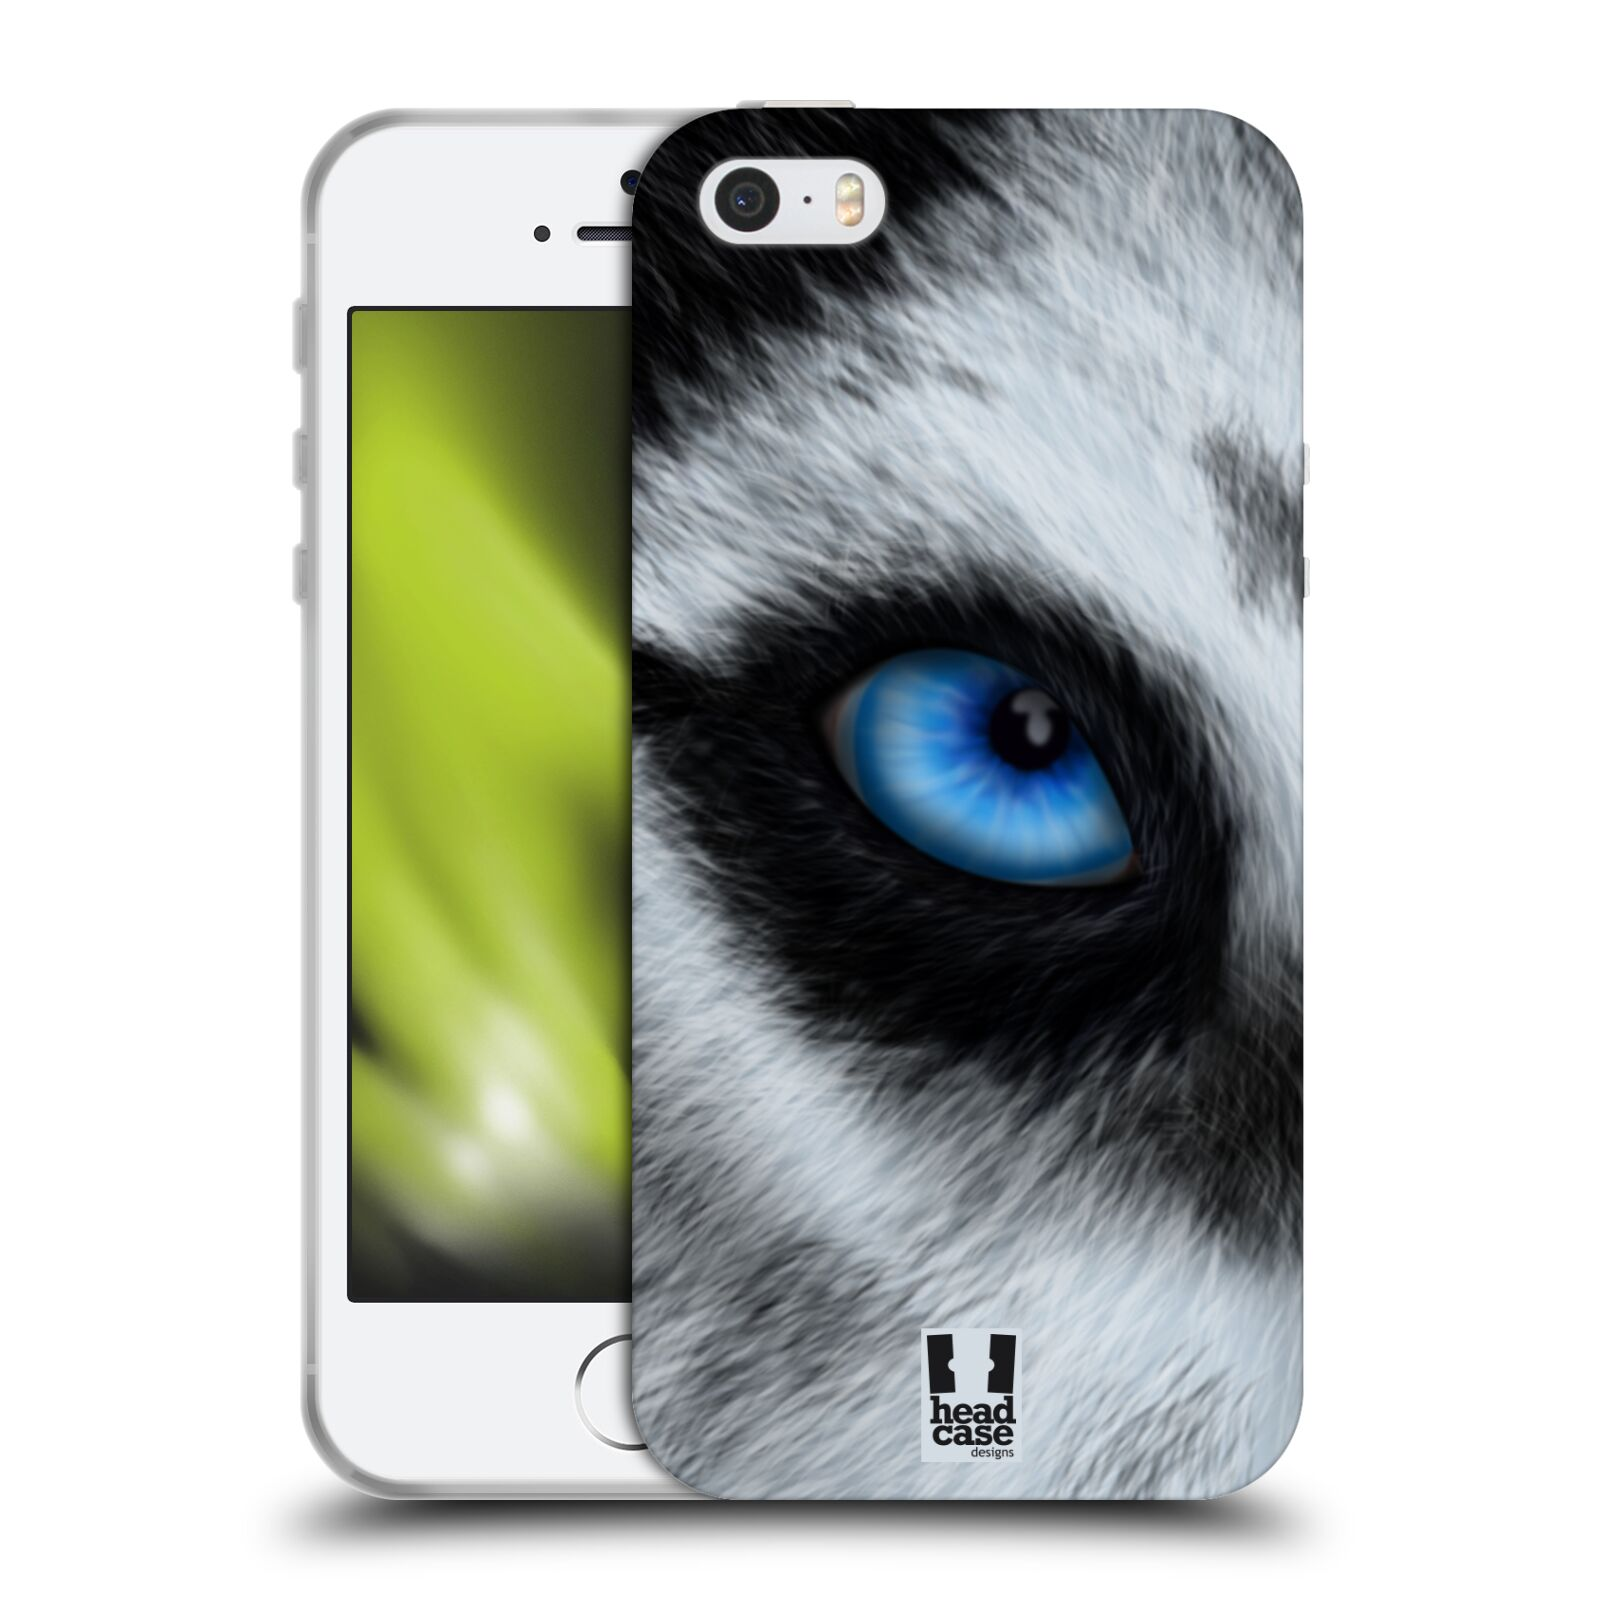 HEAD CASE silikonový obal na mobil Apple Iphone 5/5S vzor pohled zvířete oko pes husky